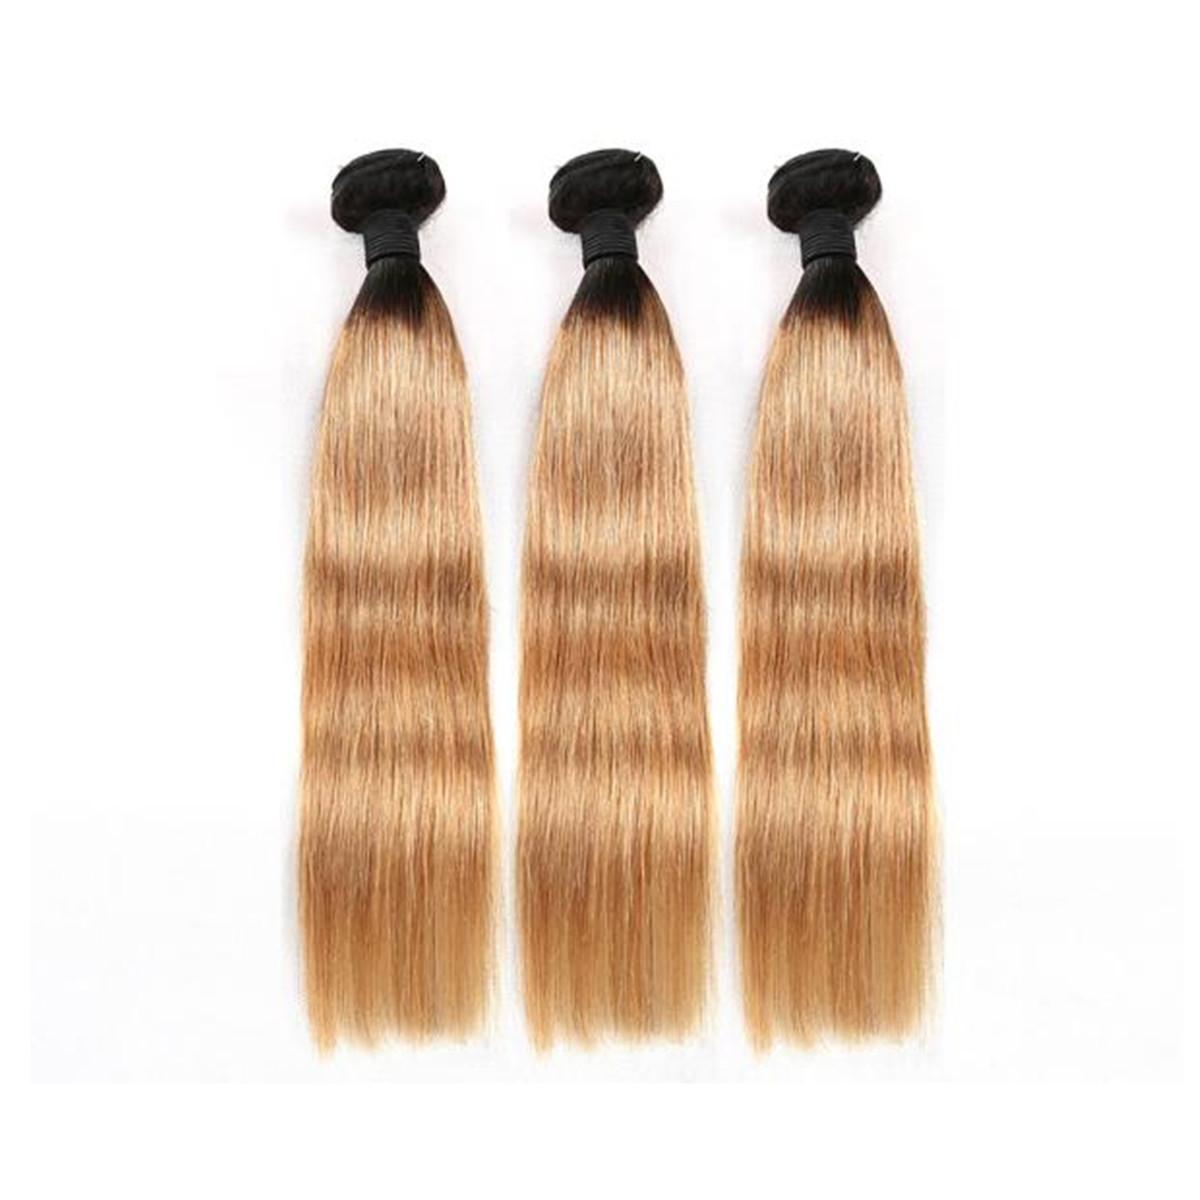 LEDON Hair Weft, Straight, color 1b/27,100% Human Hair Extensions,100g, 1 Piece